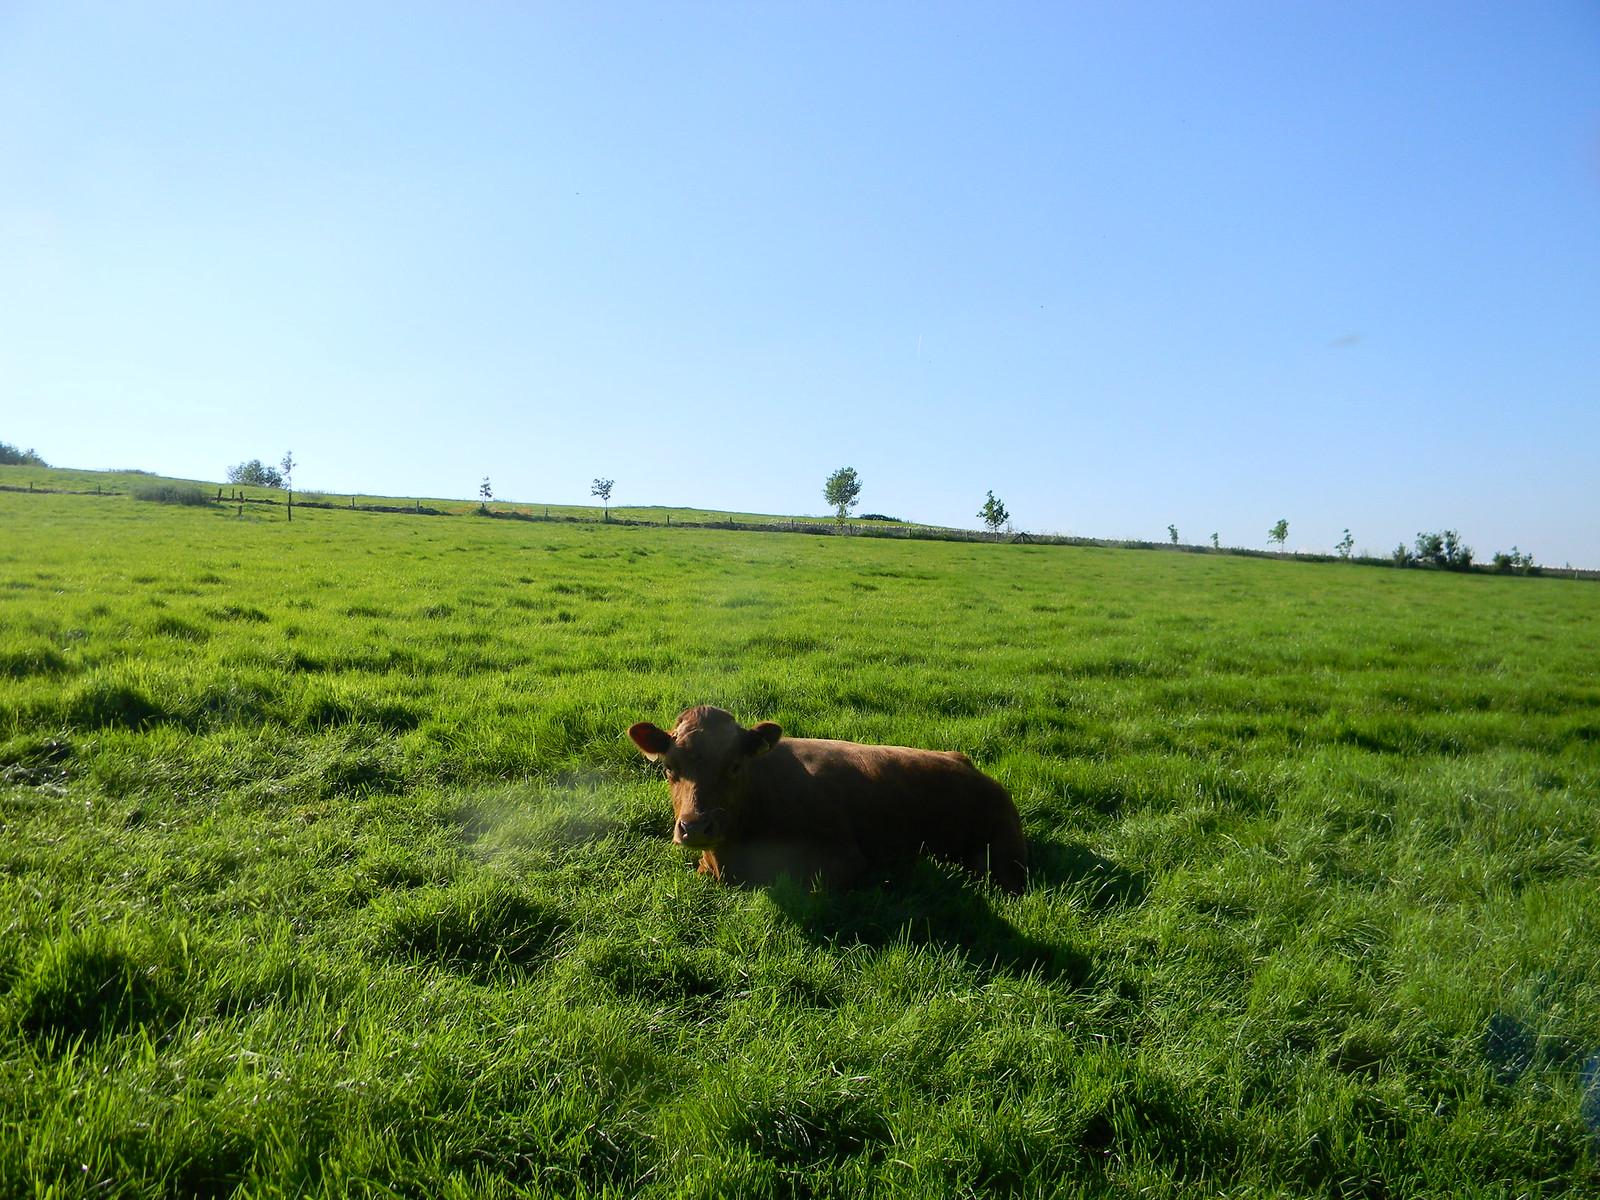 Cow in a field Moreton-in-Marsh Circular